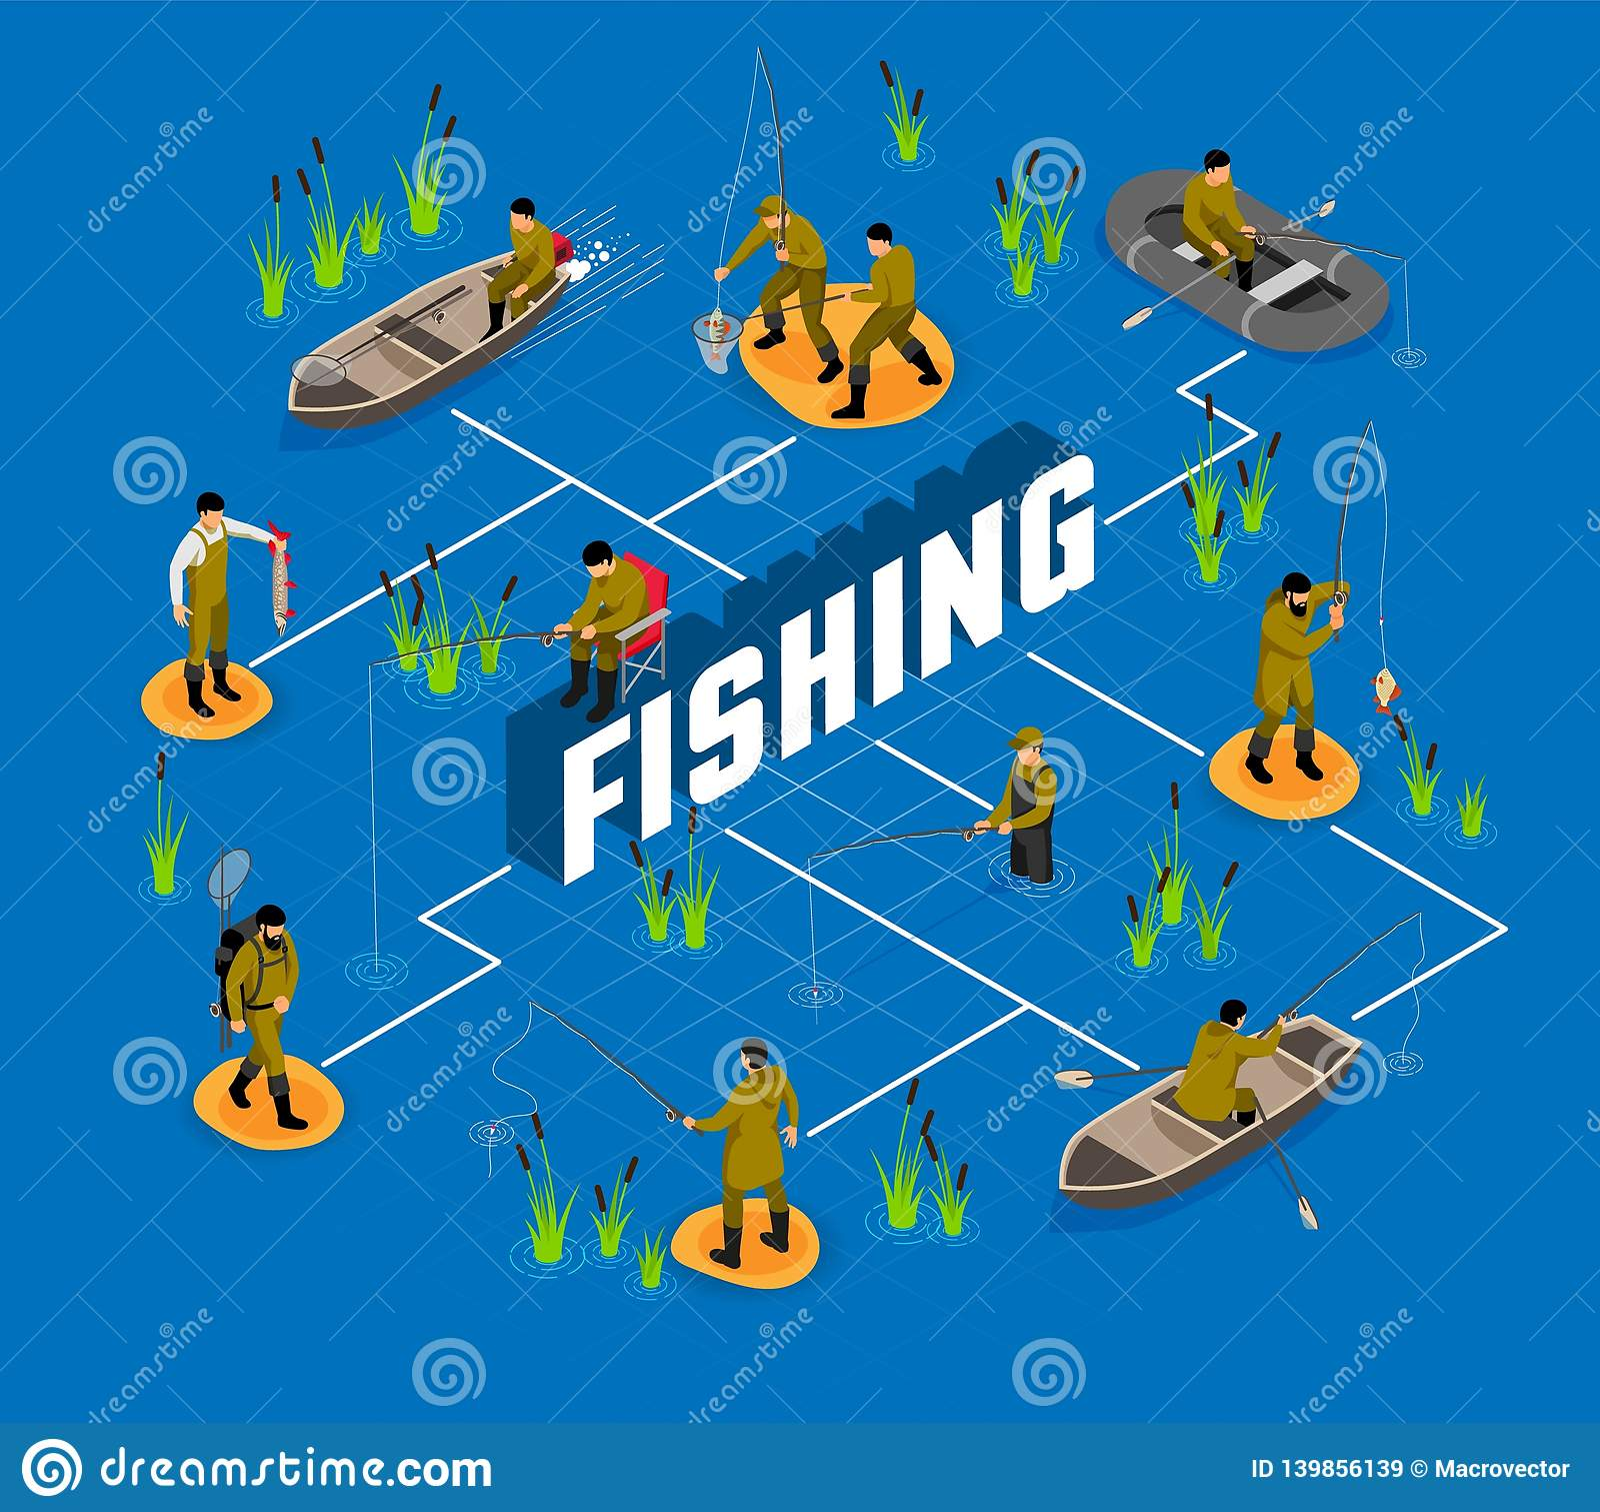 Fisherman Isometric Flowchart